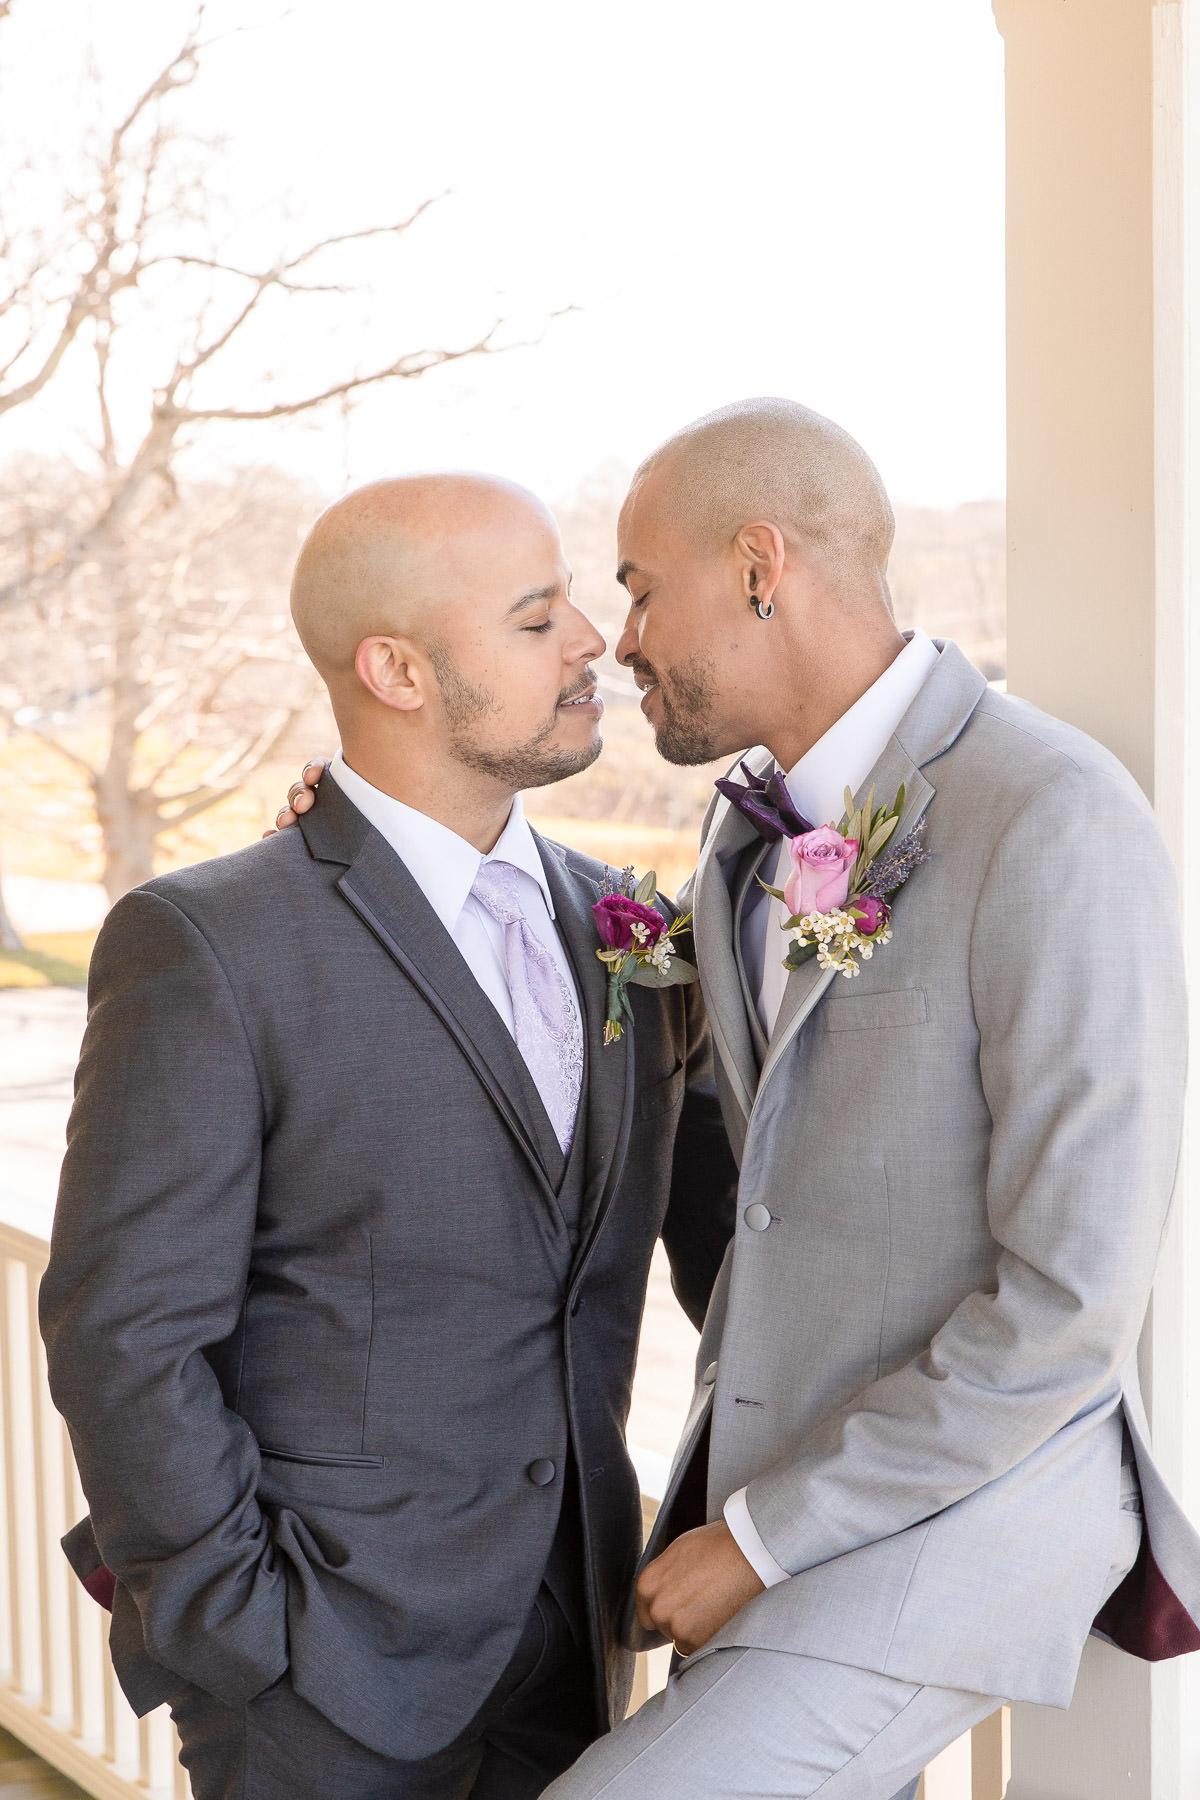 Eisenhower House, Newport, Rhode Island, Tracy Jenkins Photography, wedding, LGBTQ+, LGBT, Gay, Inclusive, Photography, Wedding photography, groom, grooms, couple portraits